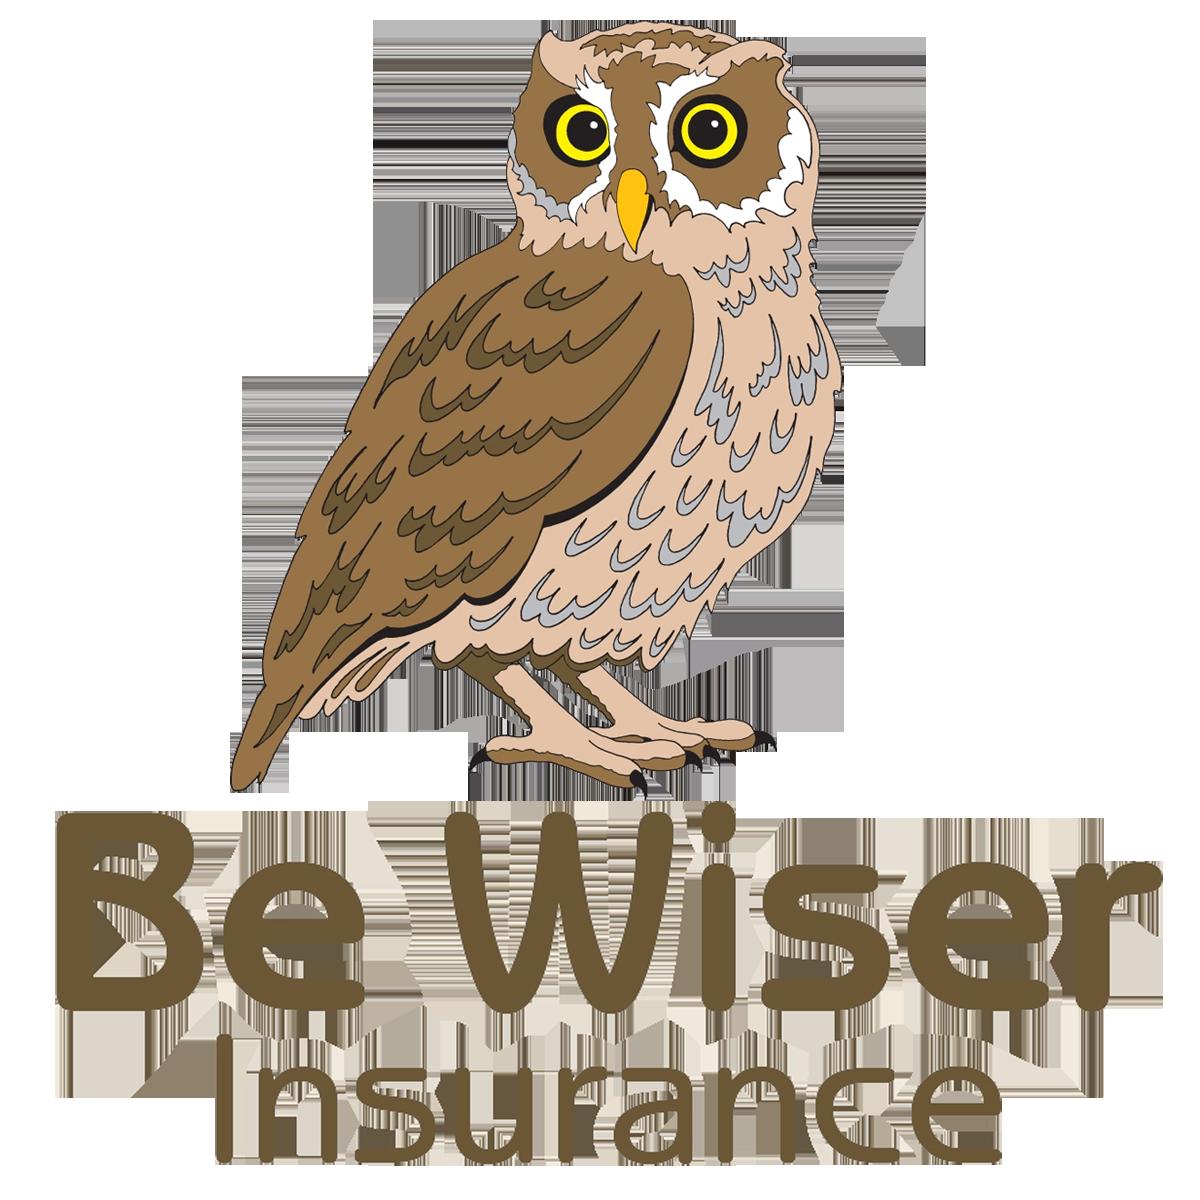 logo be wiser